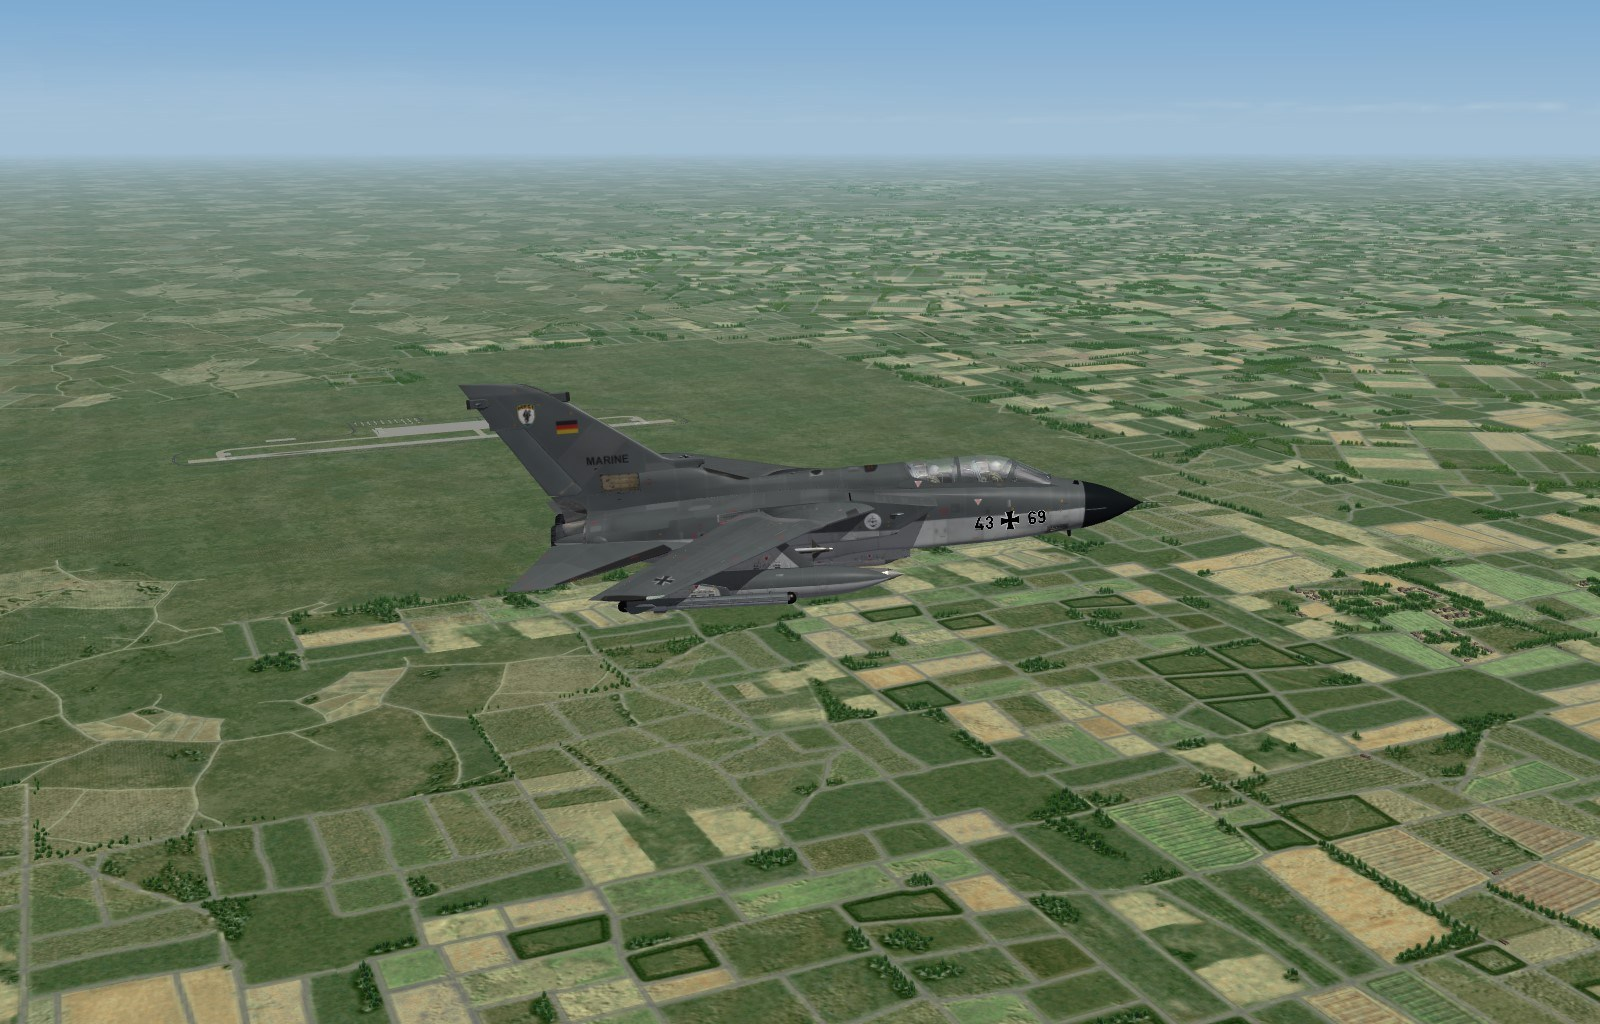 TornadoMFG00019.JPG